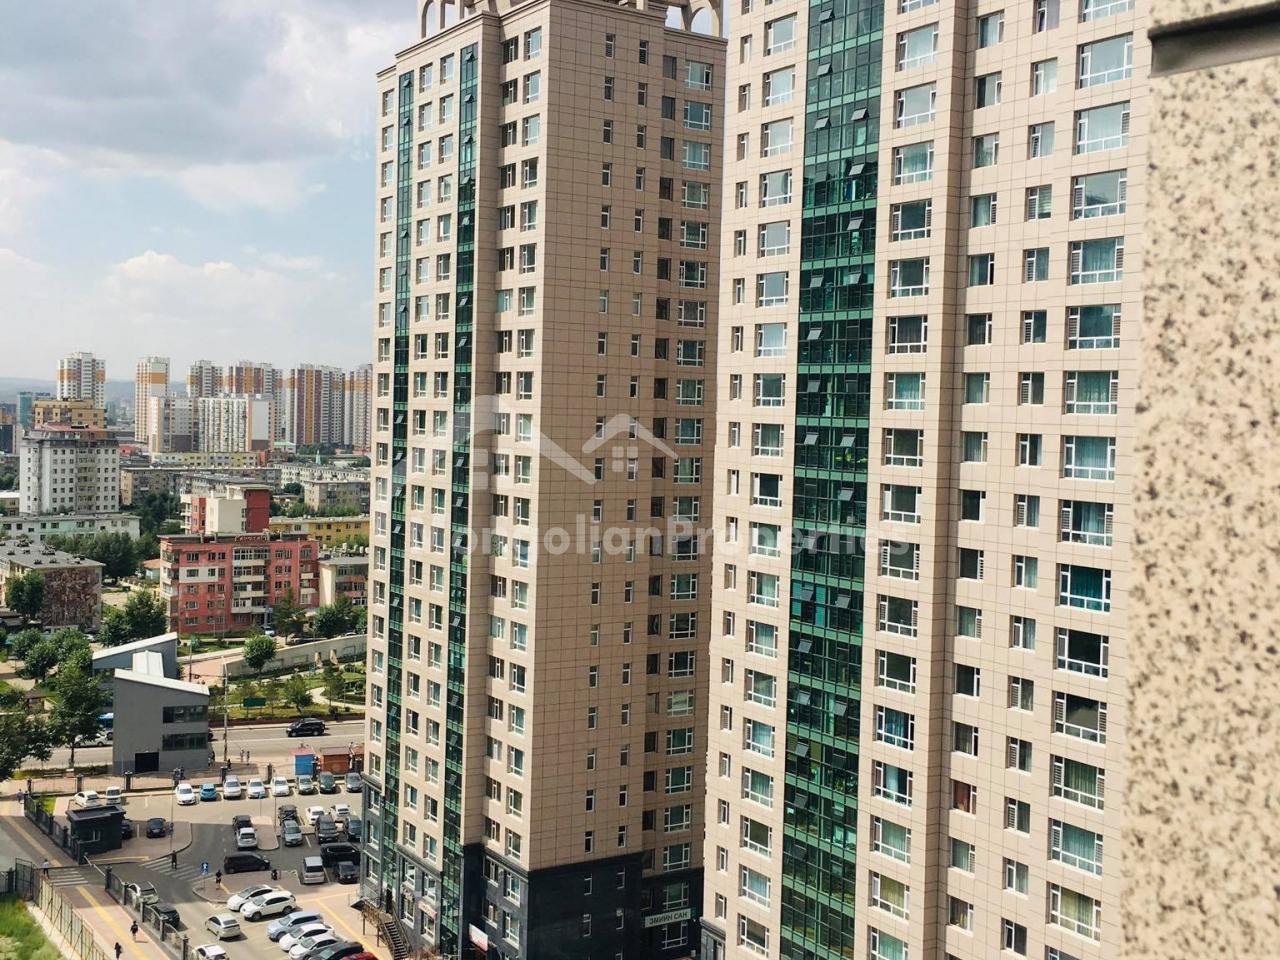 1 bedroom apartment in Tsengeldeh town next to the Naadam center